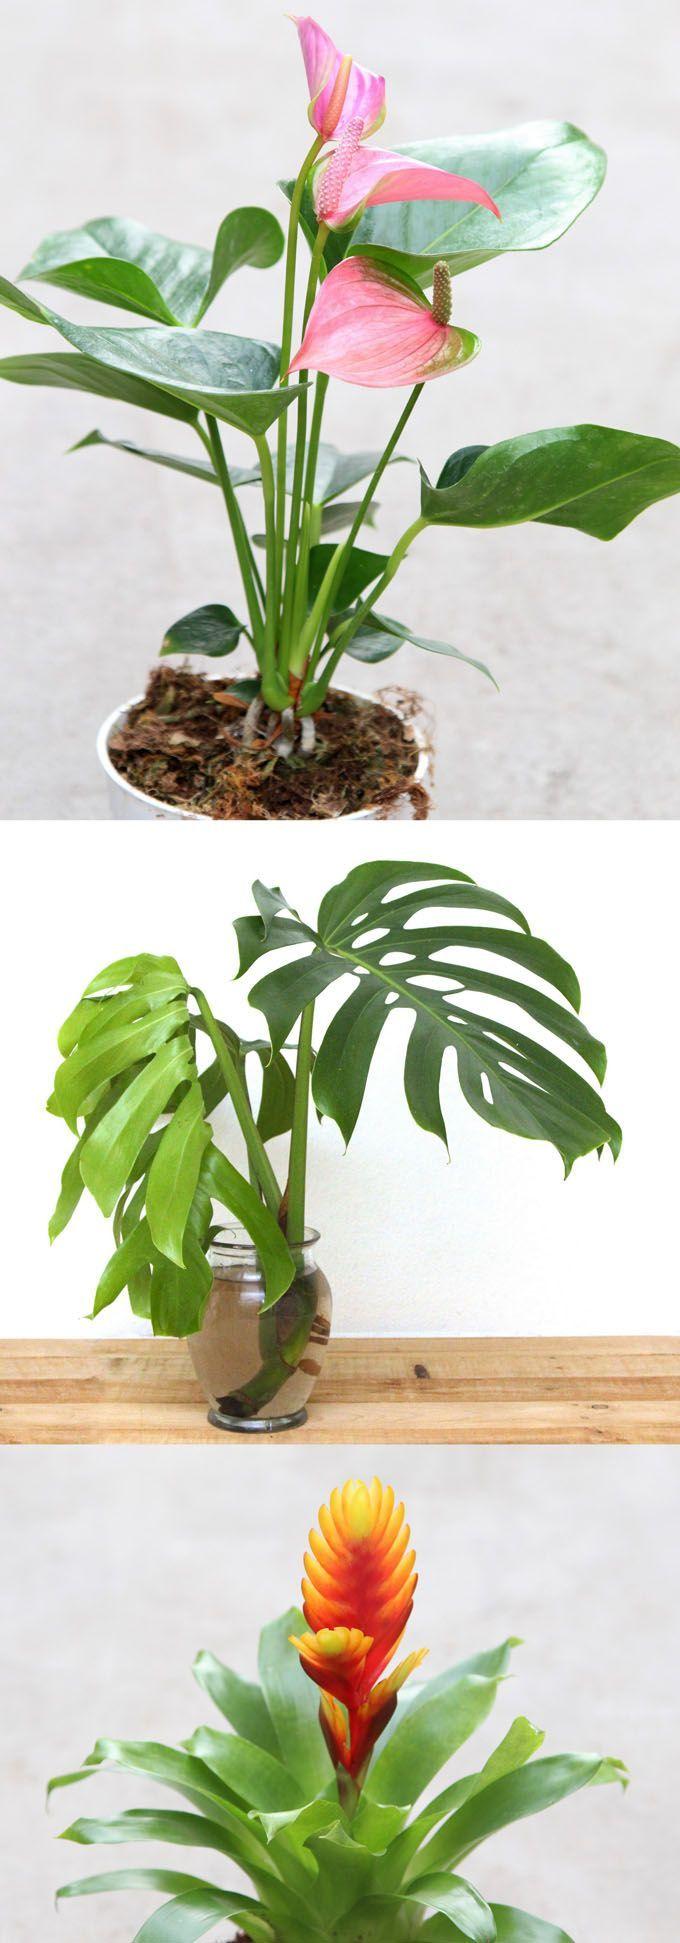 indoor plants nasa - photo #26